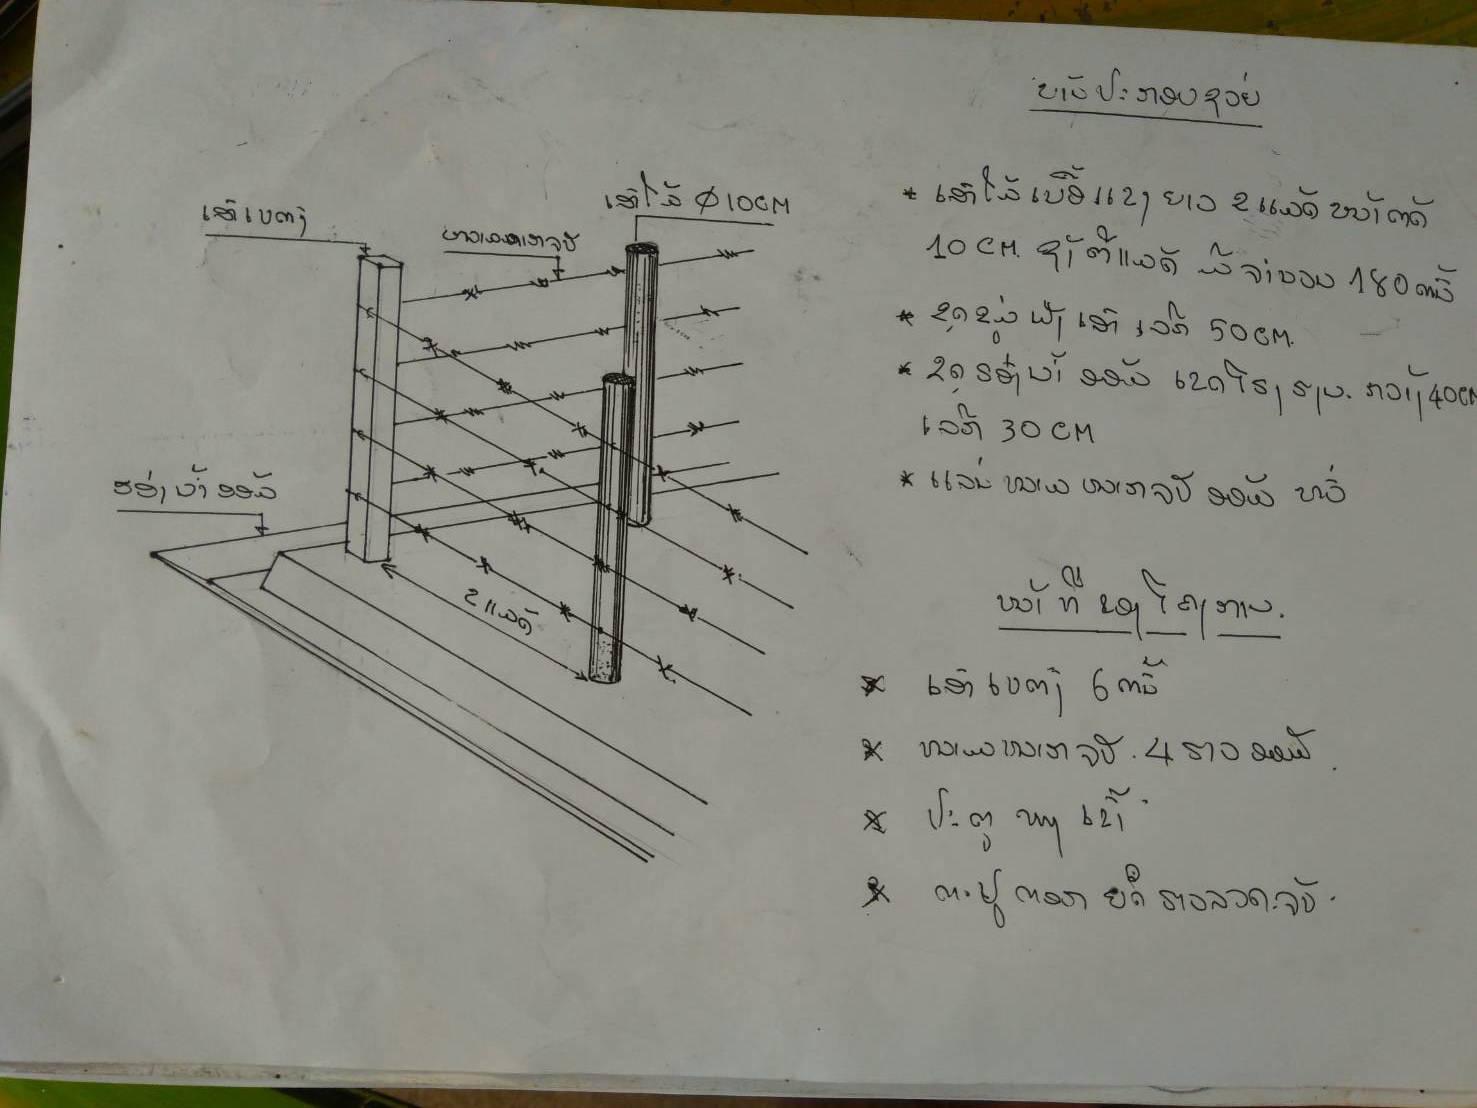 Perimeter Fence & Dirt Ditch_v1_current.JPG